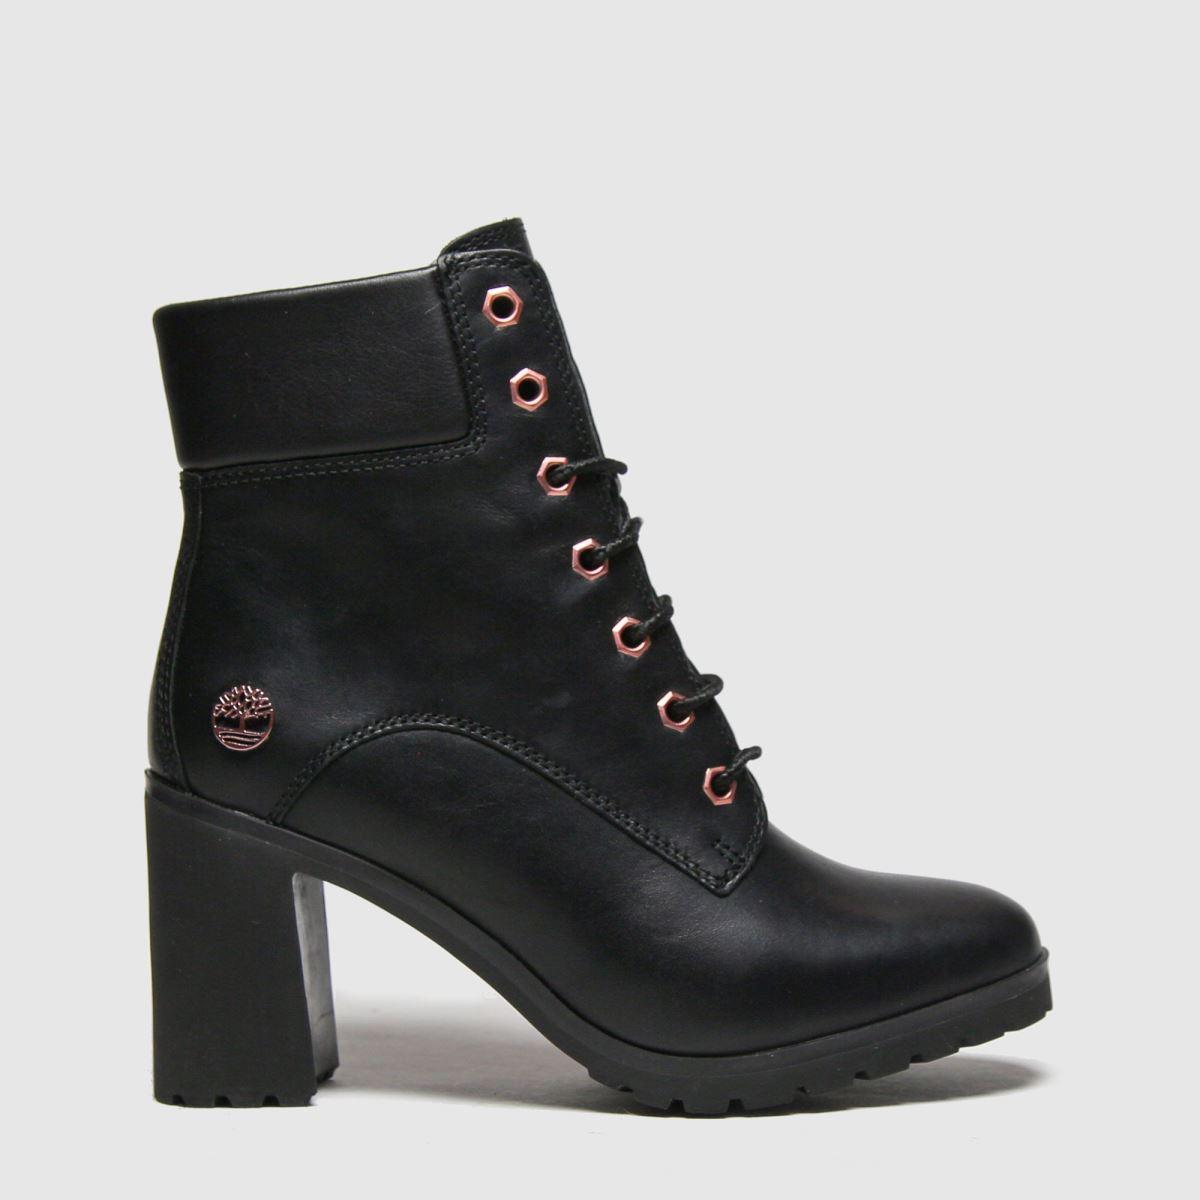 Timberland Black & Gold Allington Boots